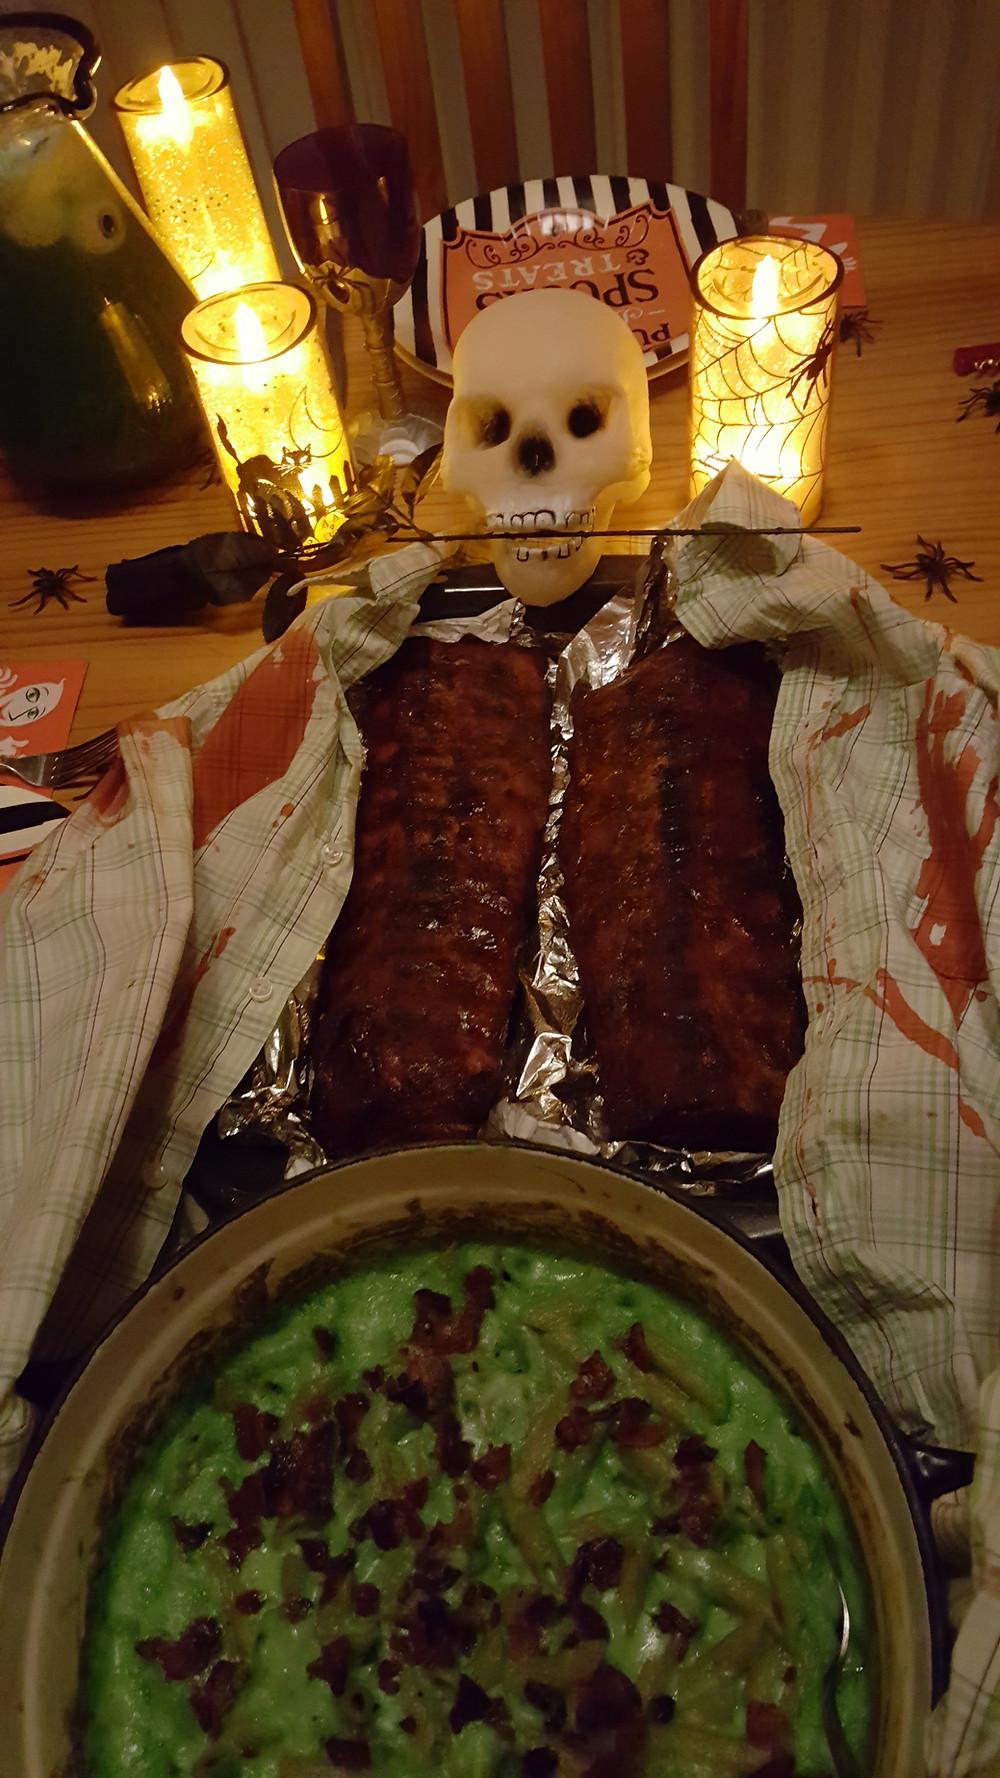 Halloween Dinner Ribs with Bacon Mac n Cheese